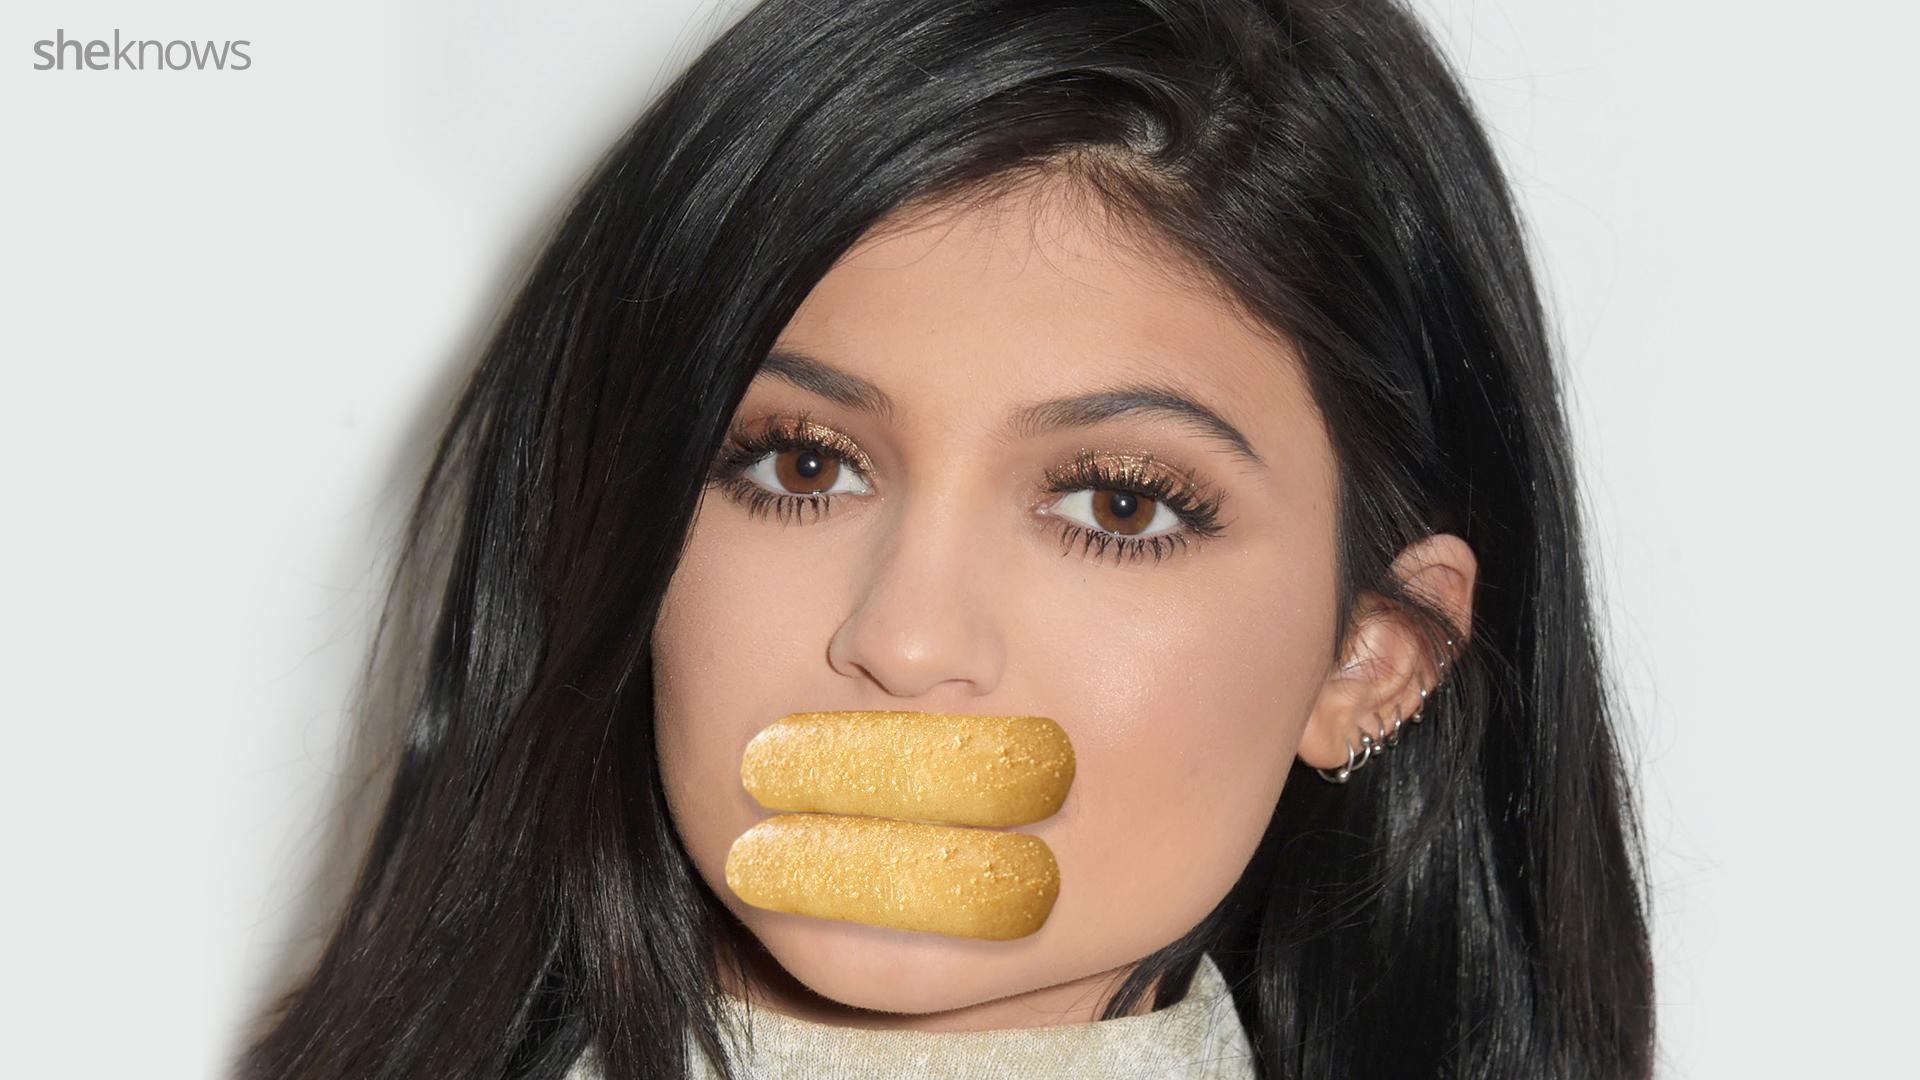 kylie jenner breadstick lips